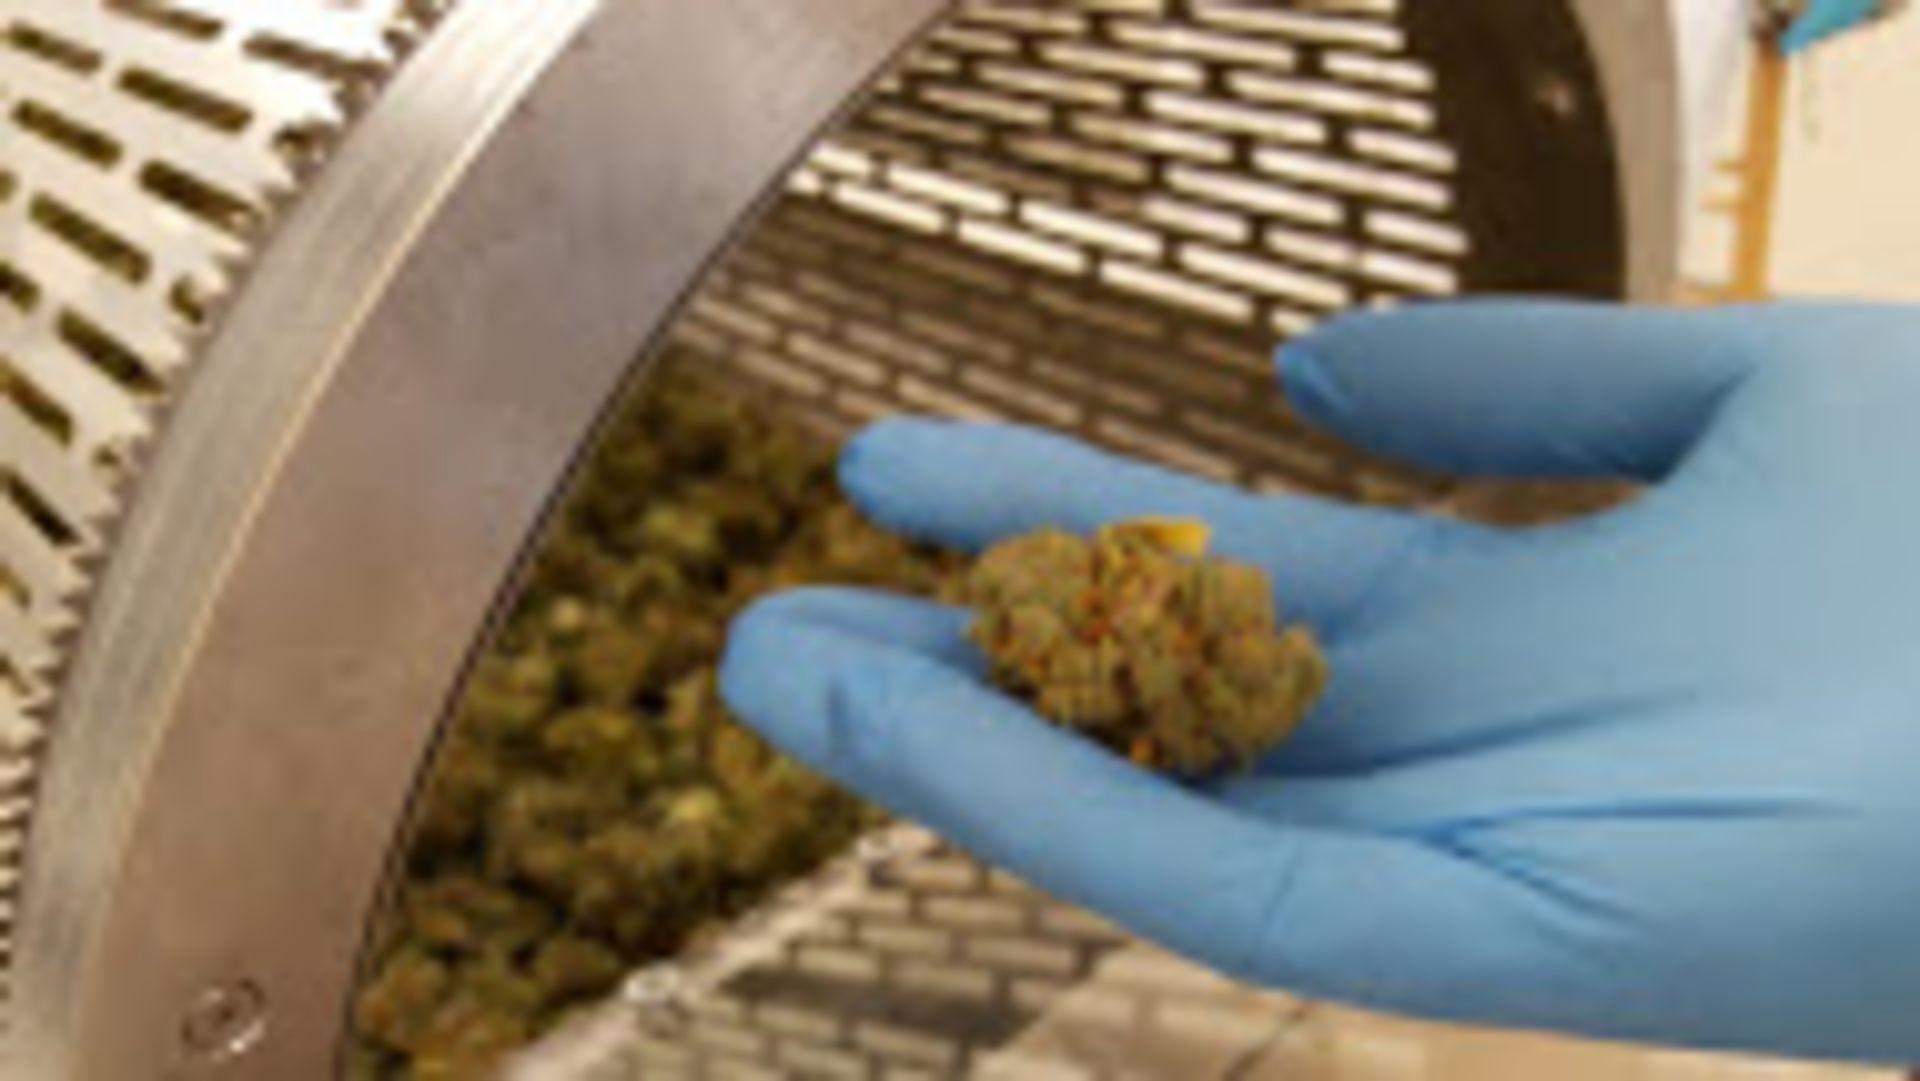 Unused/FactoryNew Revolution Cannabis & Hemp Flower Finisher System Model RDF 4300.100-200 lbs/8 hrs - Image 28 of 32